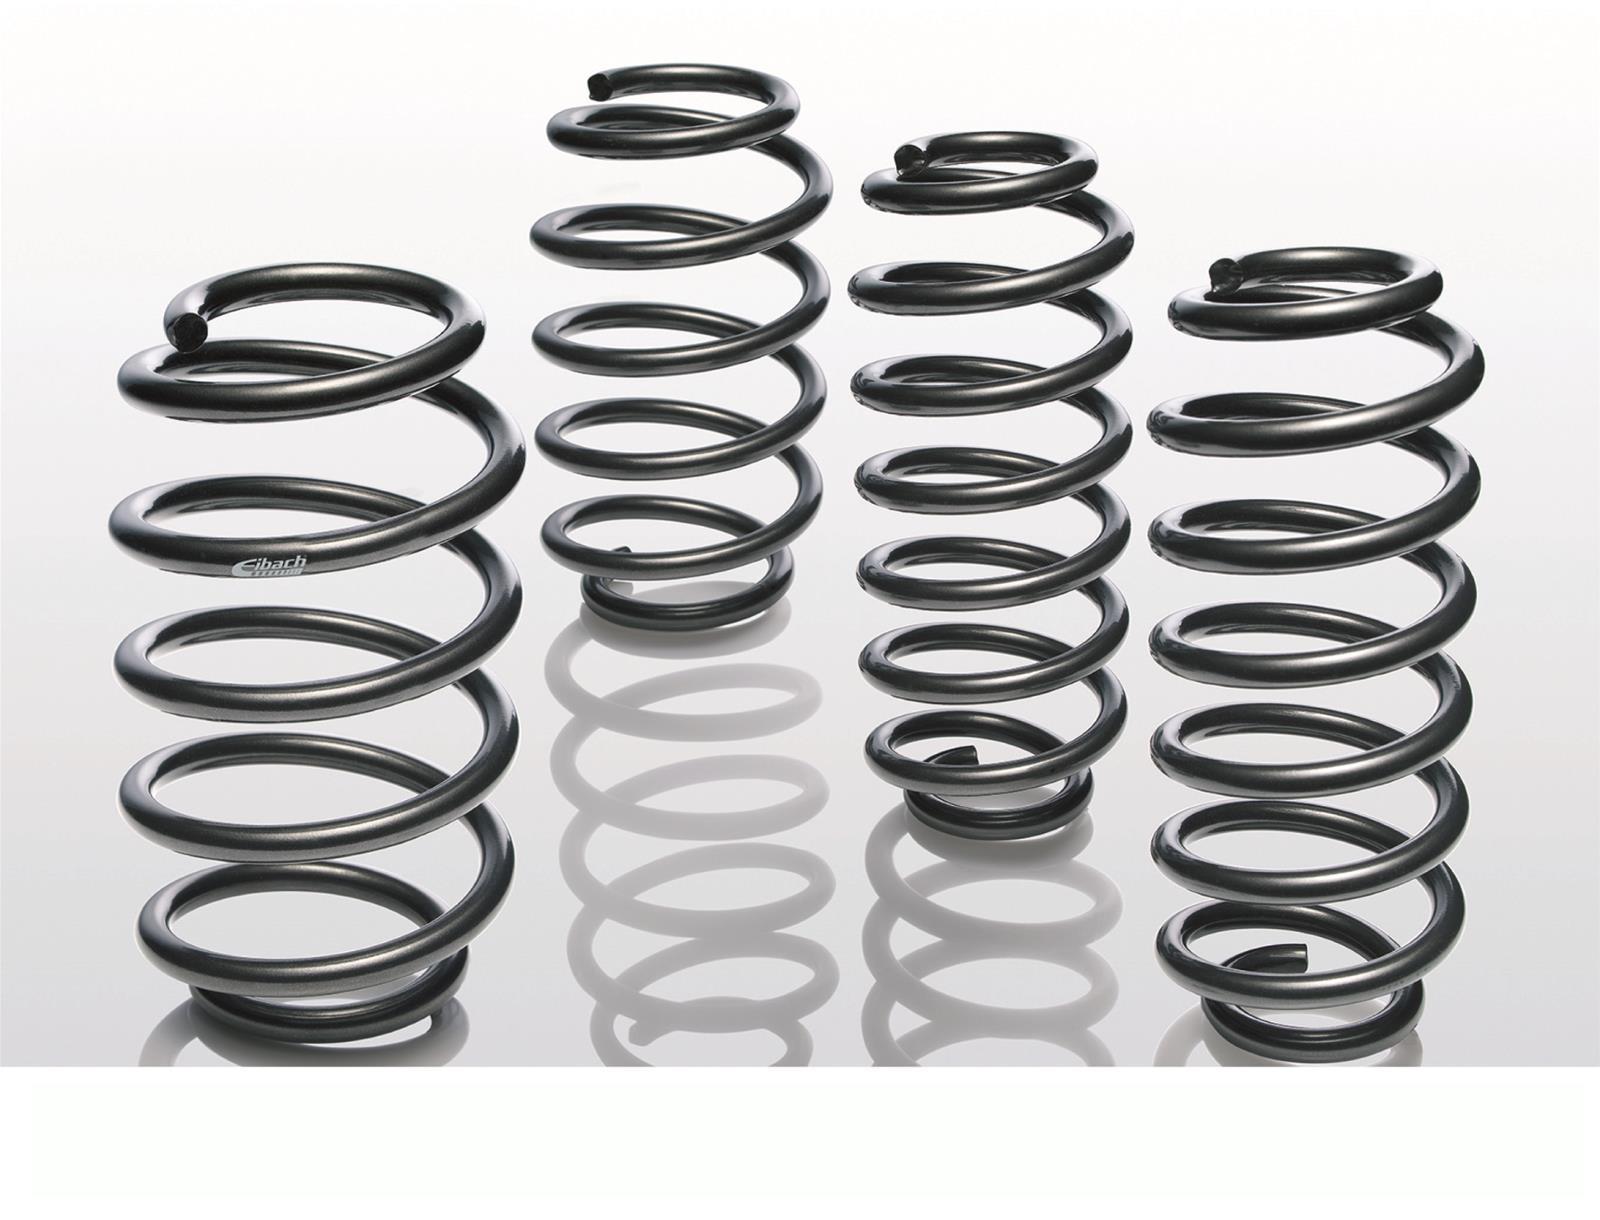 Eibach E10-15-011-02-22 Performance Pro-Kit Springs